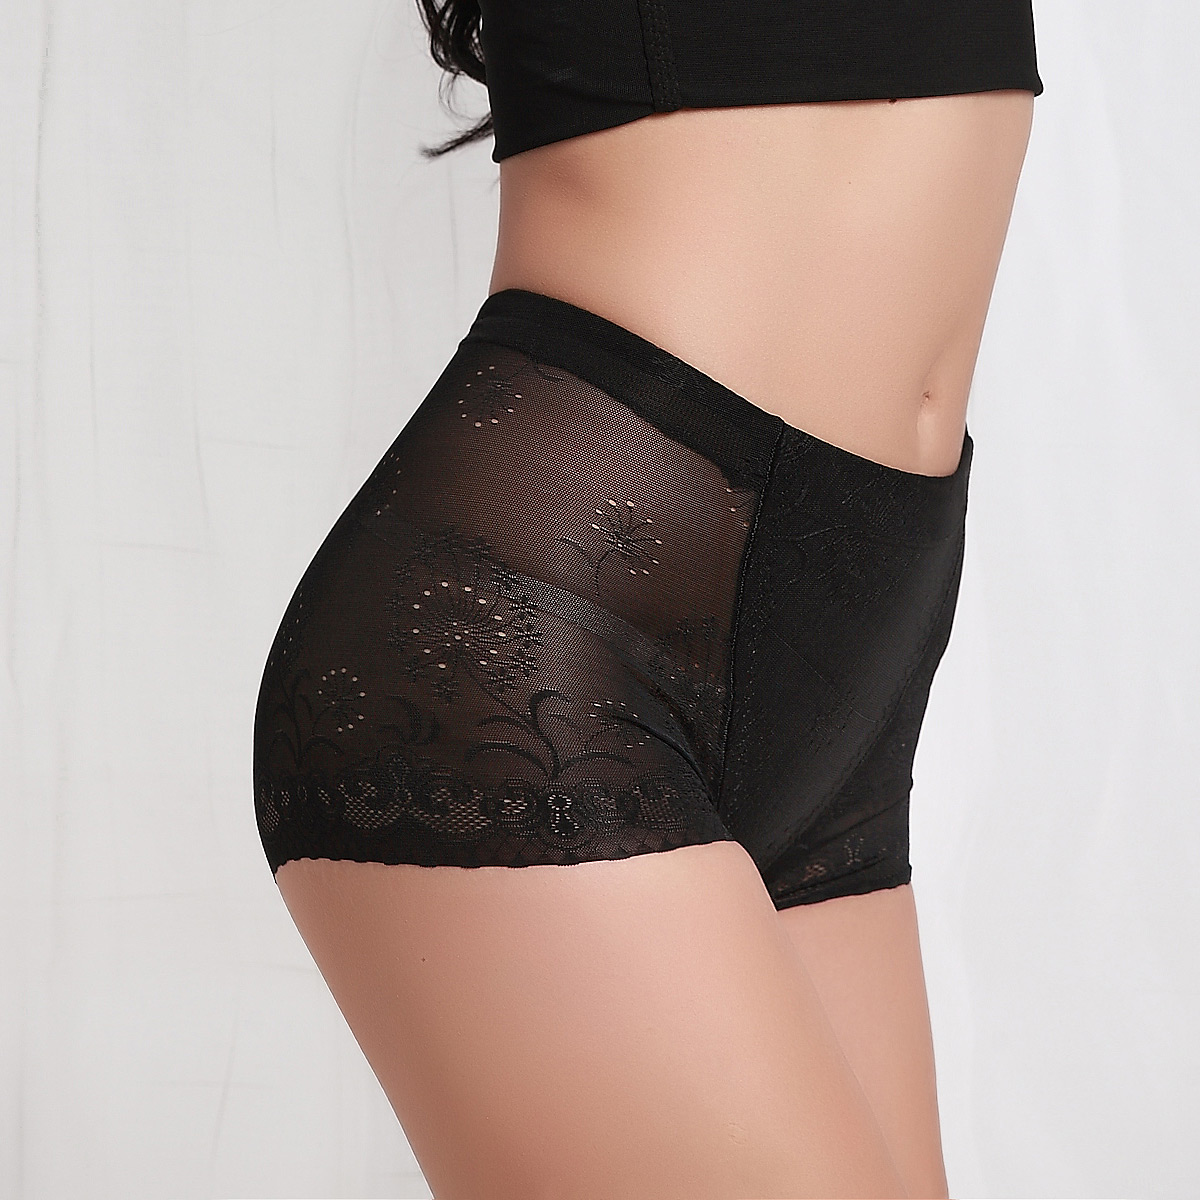 2013 spring women's mid waist body shaping panties drawing butt-lifting abdomen pants sk94 1206